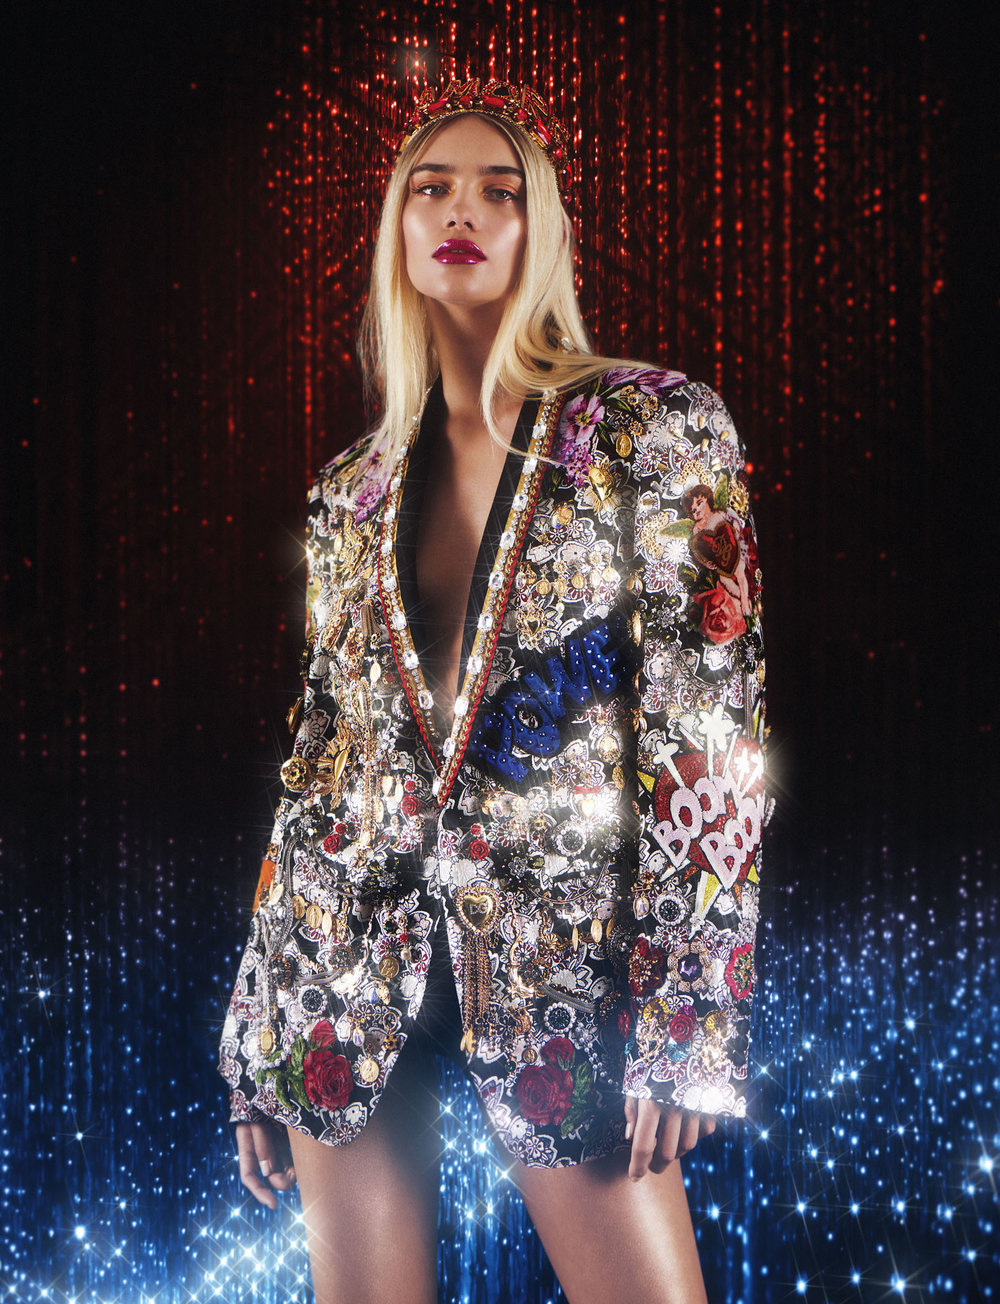 D&G / George McLeod / Luxure Magazine